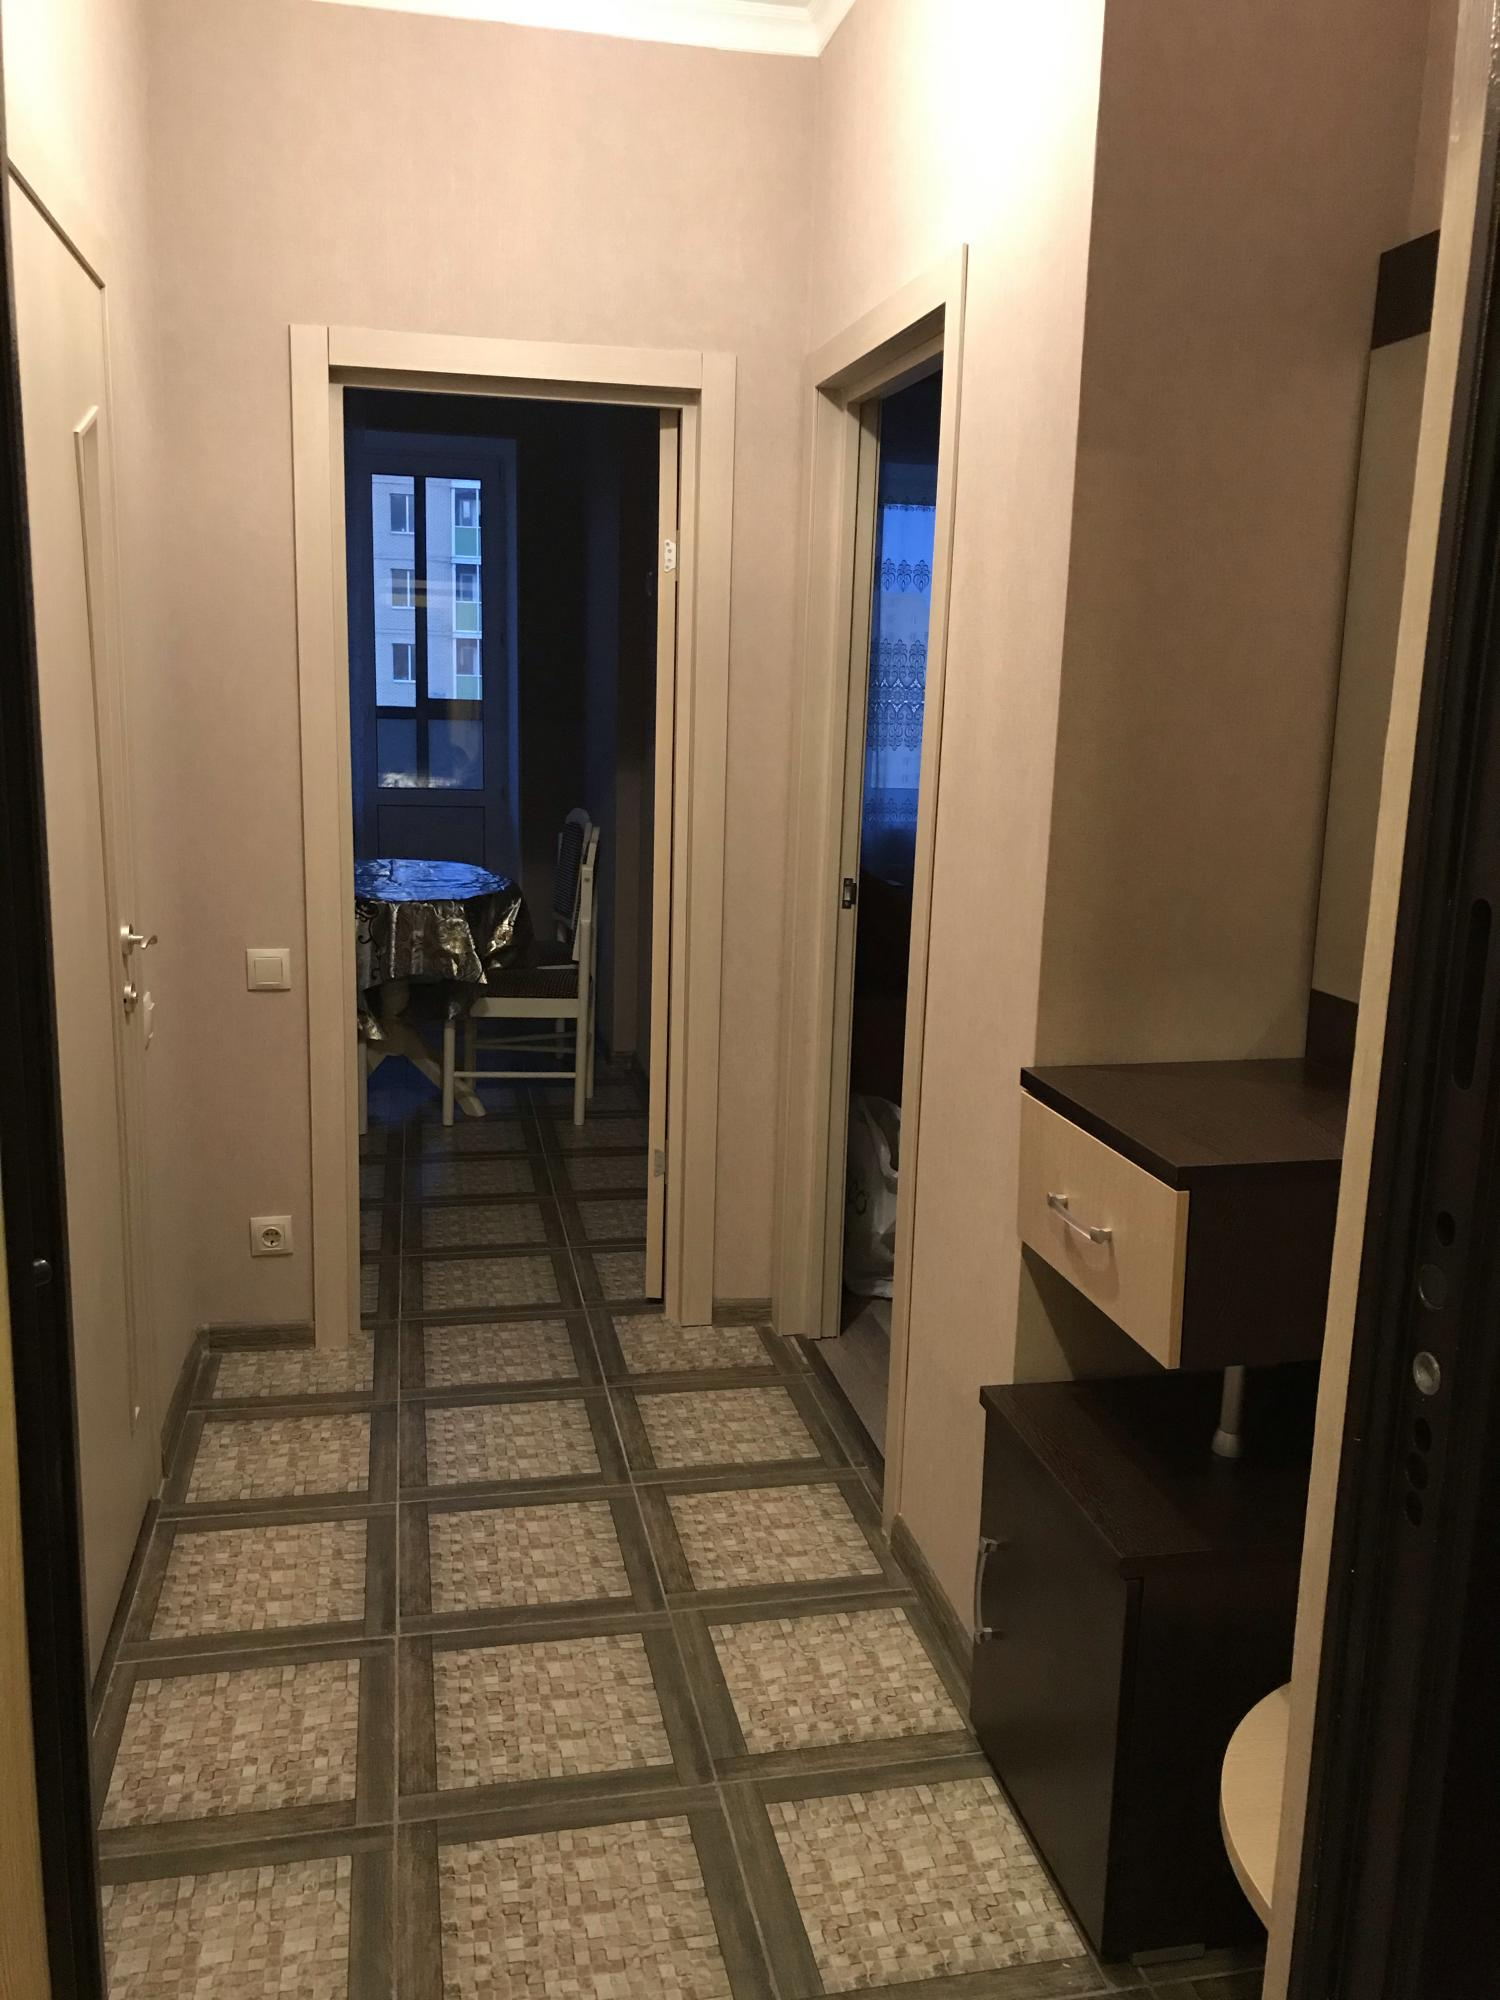 Квартира, 1 комната, 35 м² 89258601492 купить 6